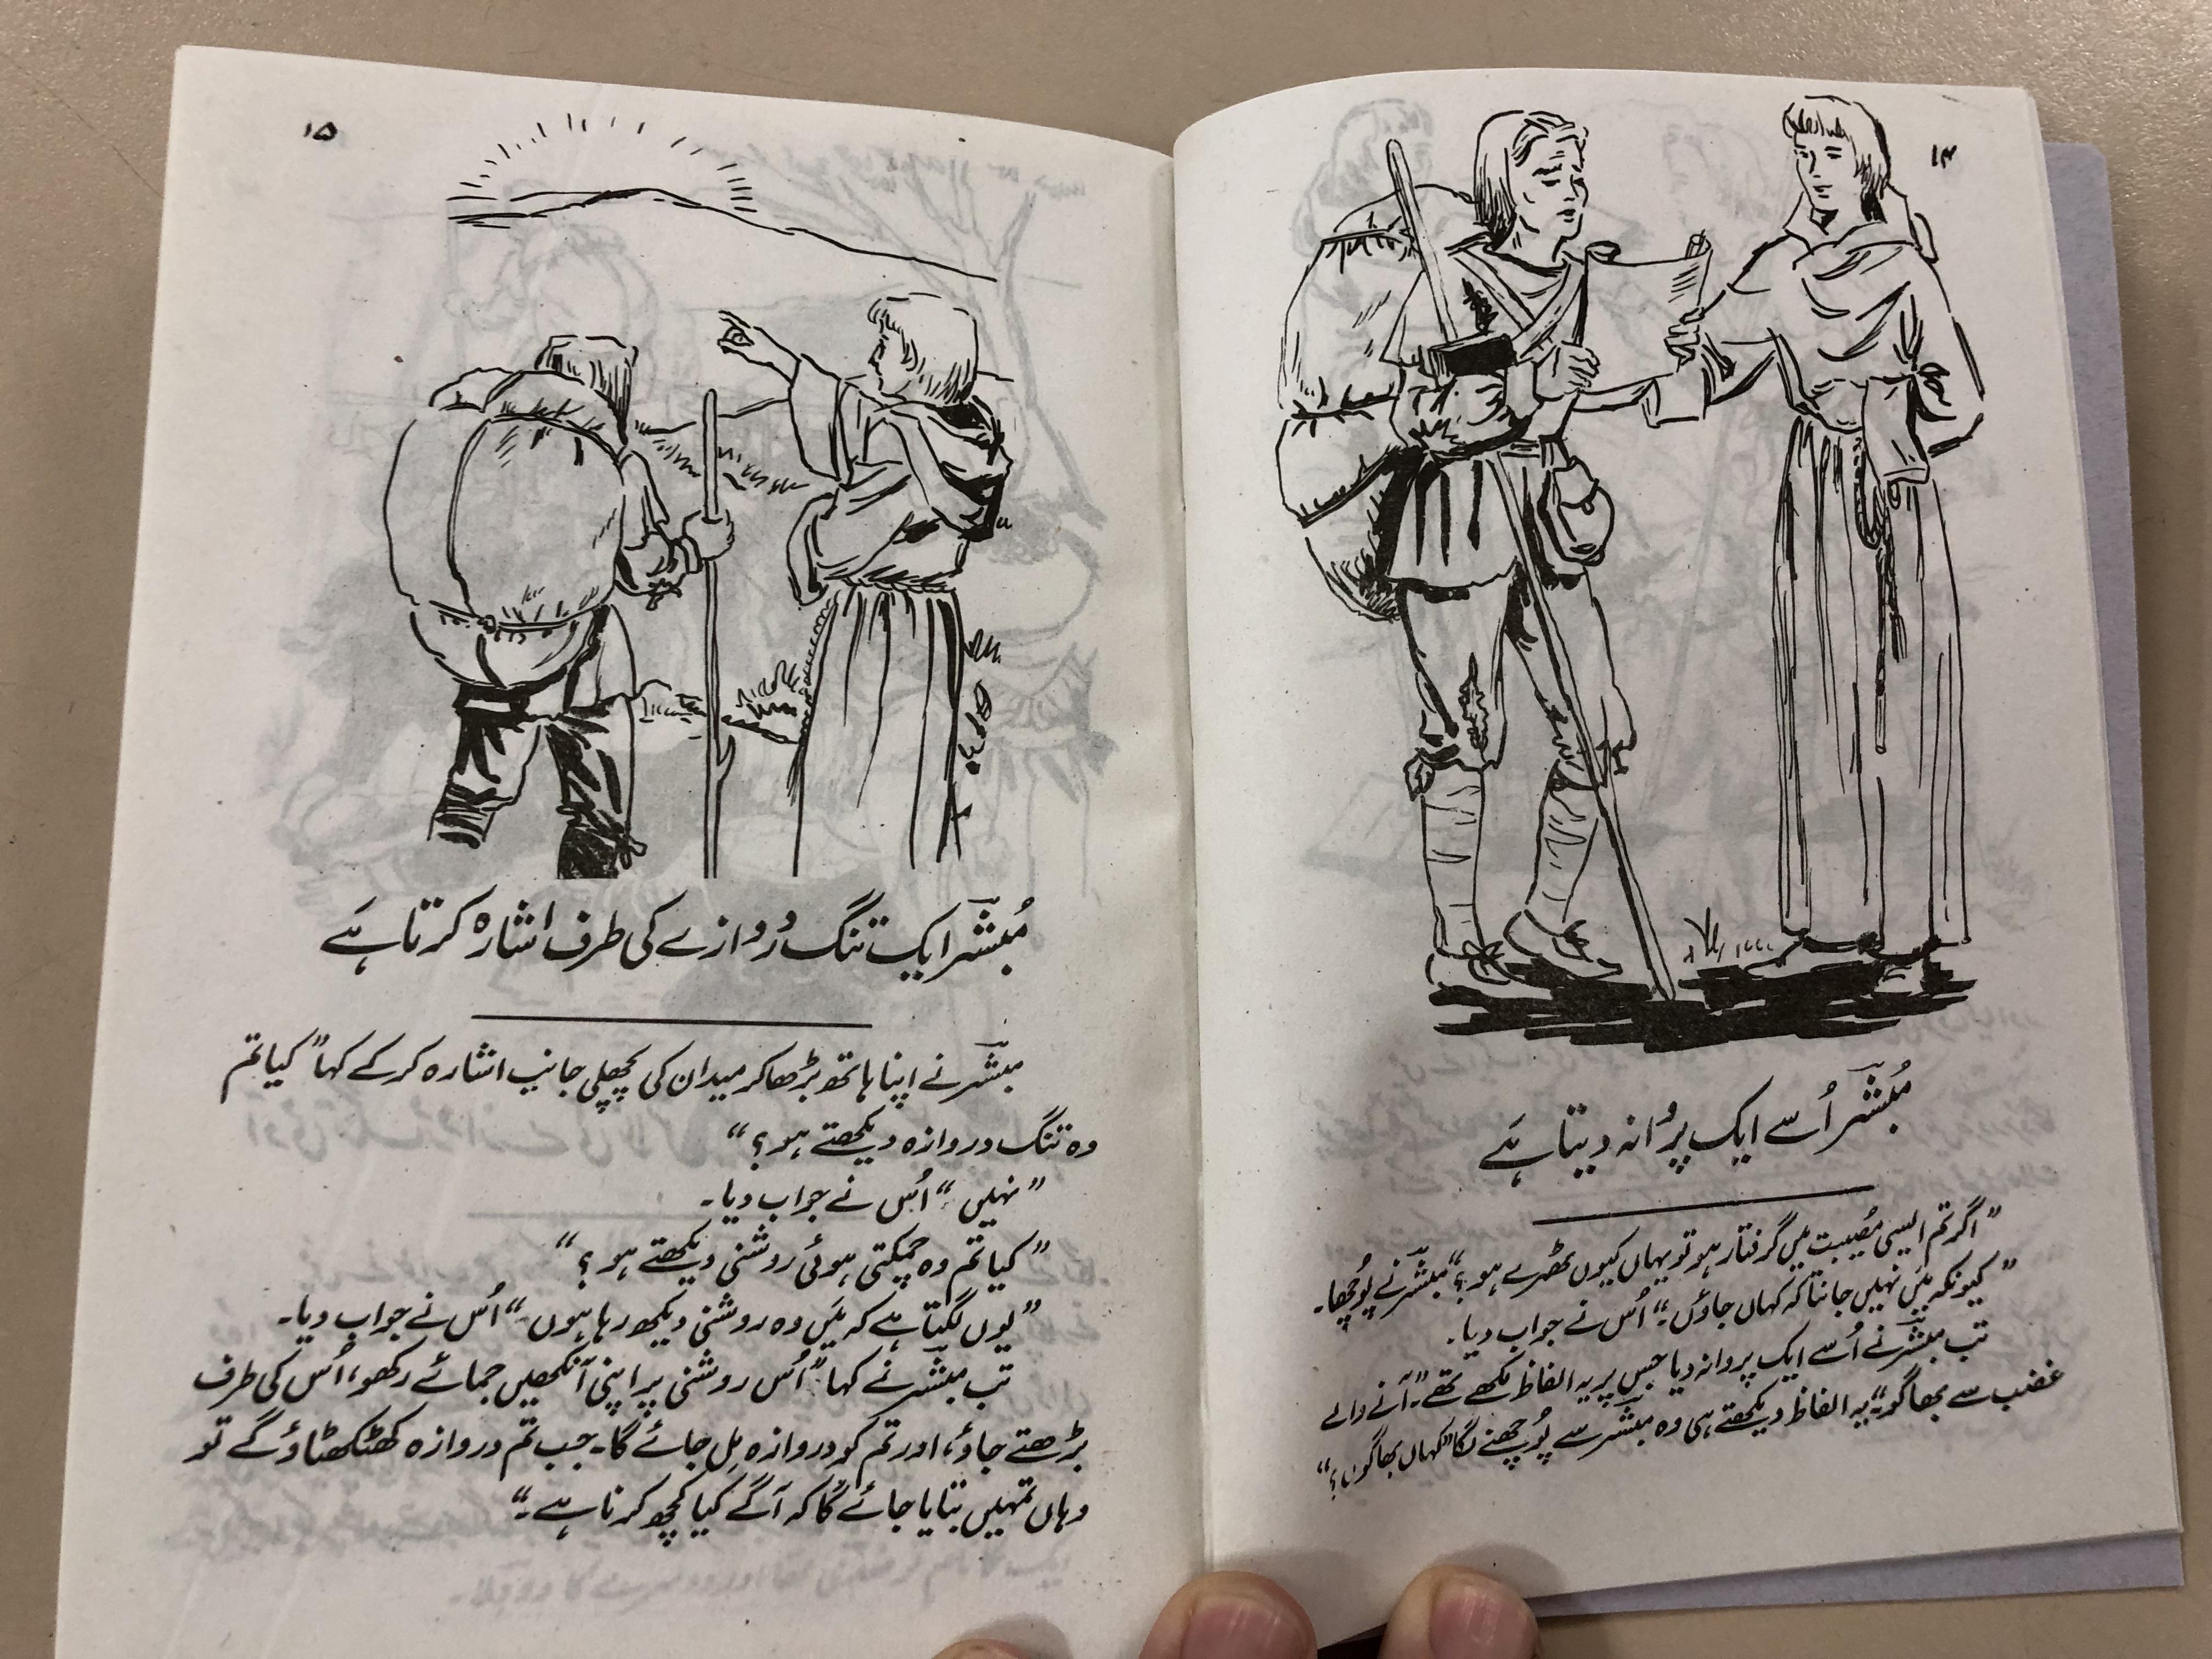 pictorial-pilgrim-s-progress-by-john-bunyan-in-urdu-language-hardcover-2019-masihi-isha-at-khana-5-.jpg